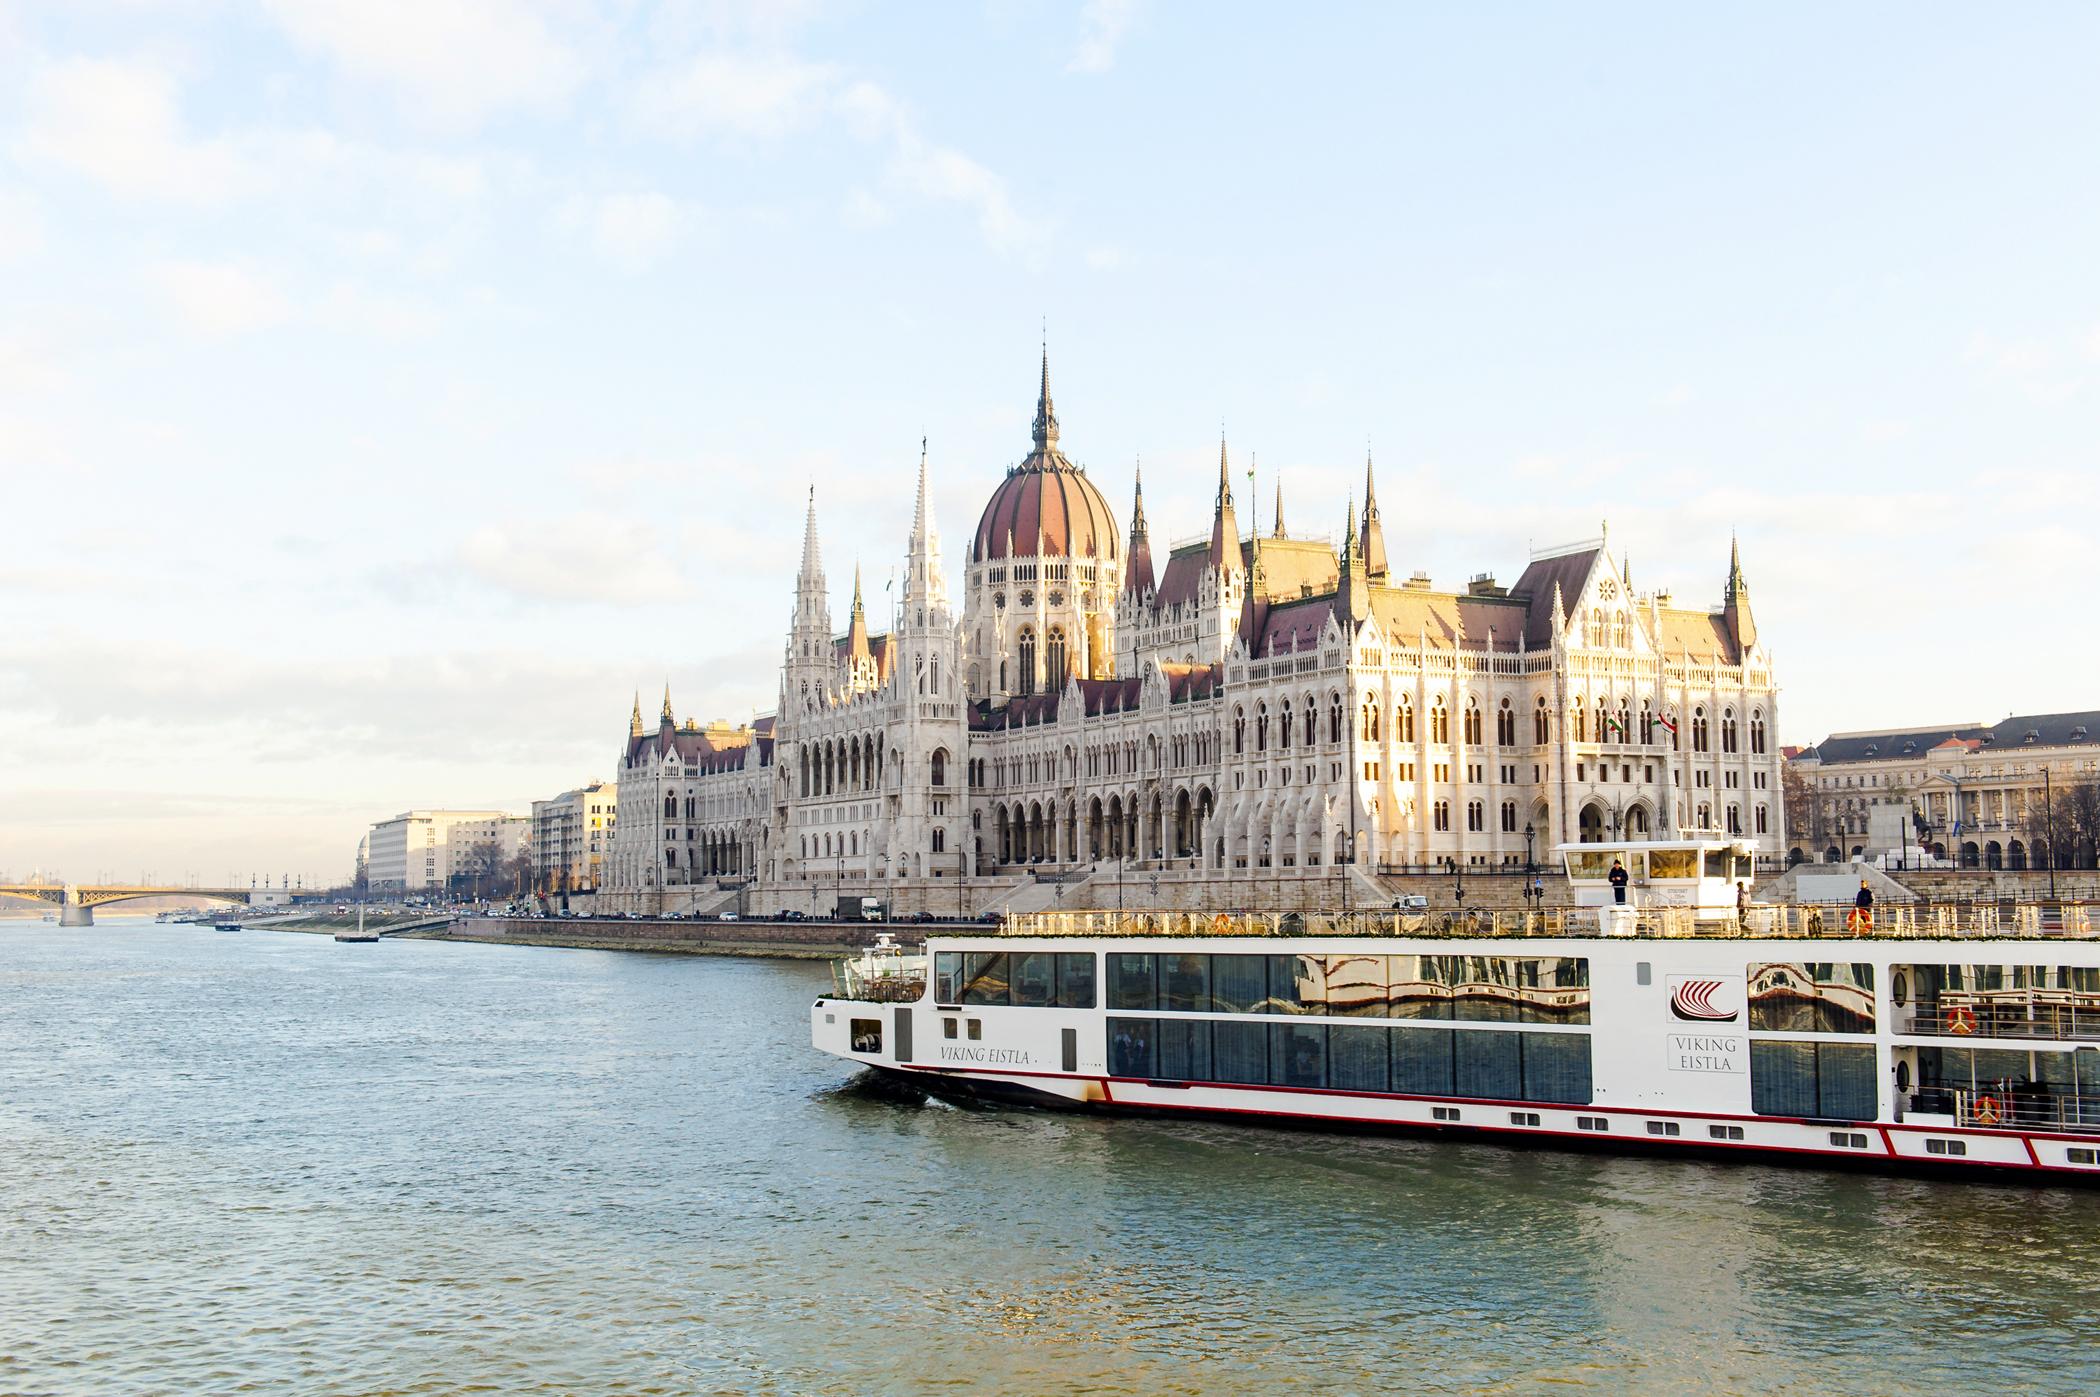 Cruising past the Budapest parliament